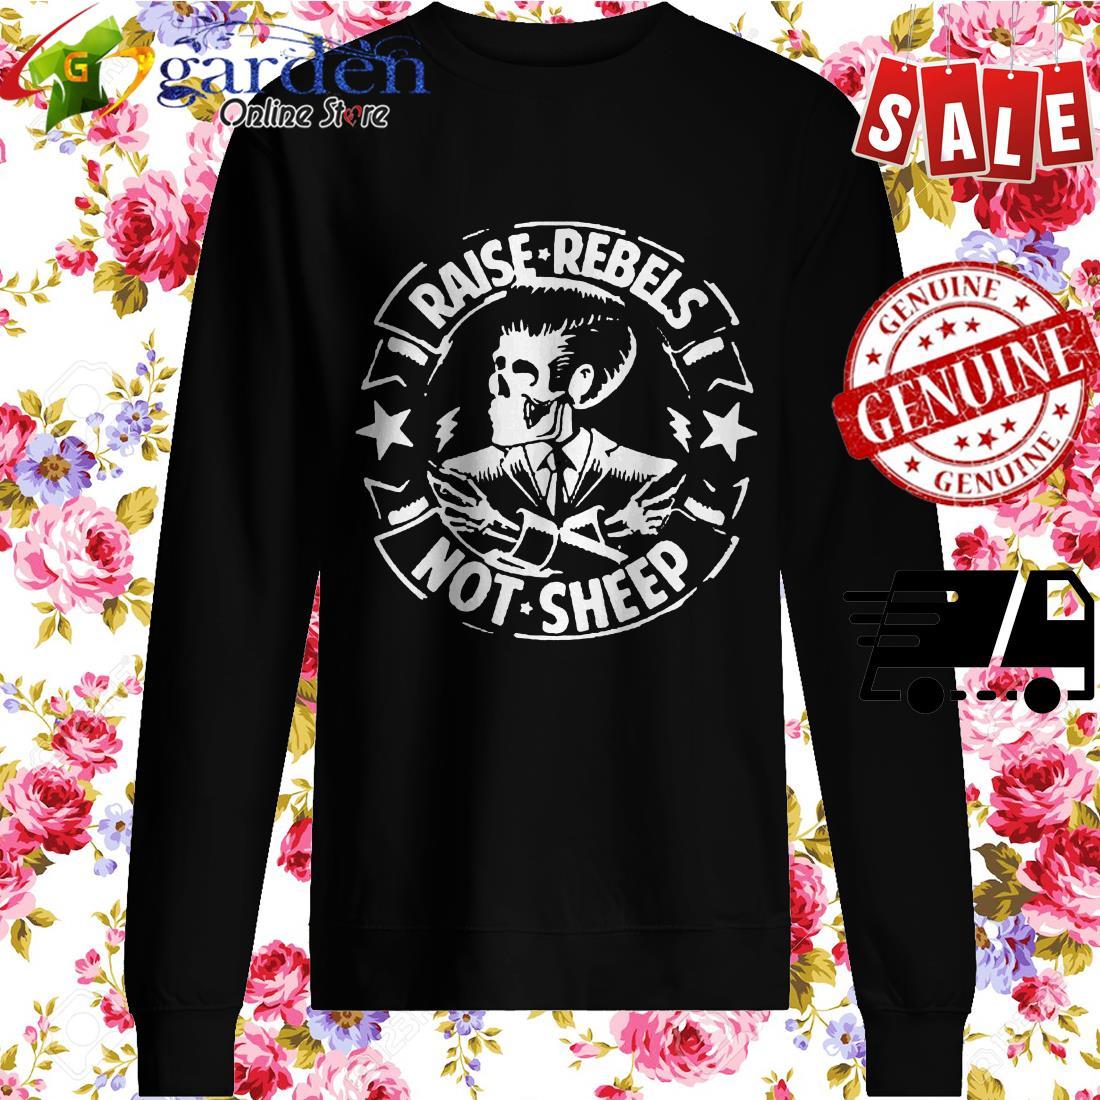 Raise Rebels Not Sheep sweater